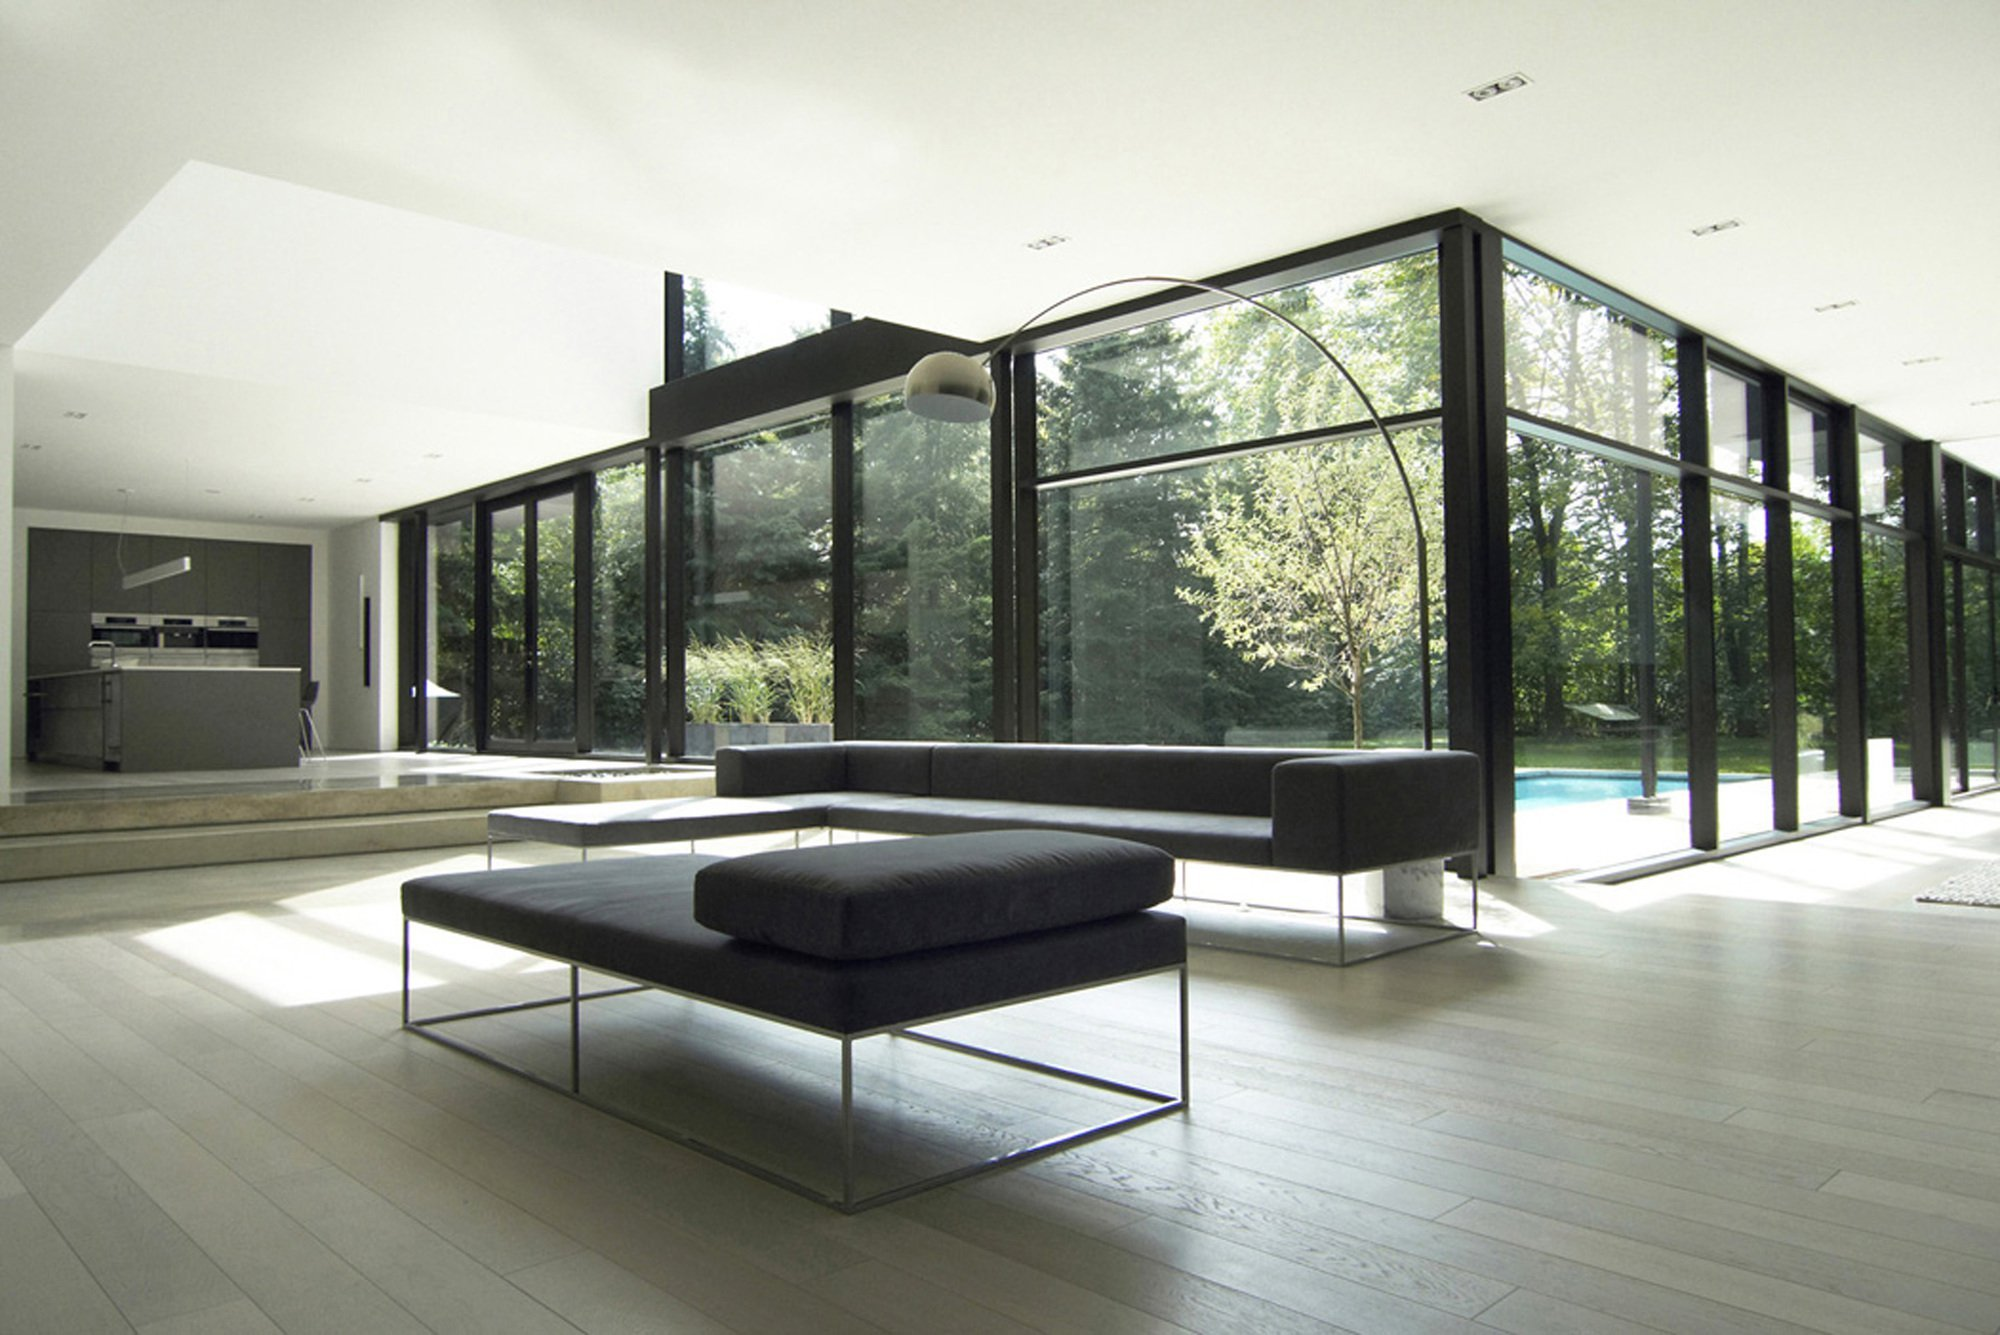 Casa oakville guido costantino plataforma arquitectura for Colores para casas minimalistas